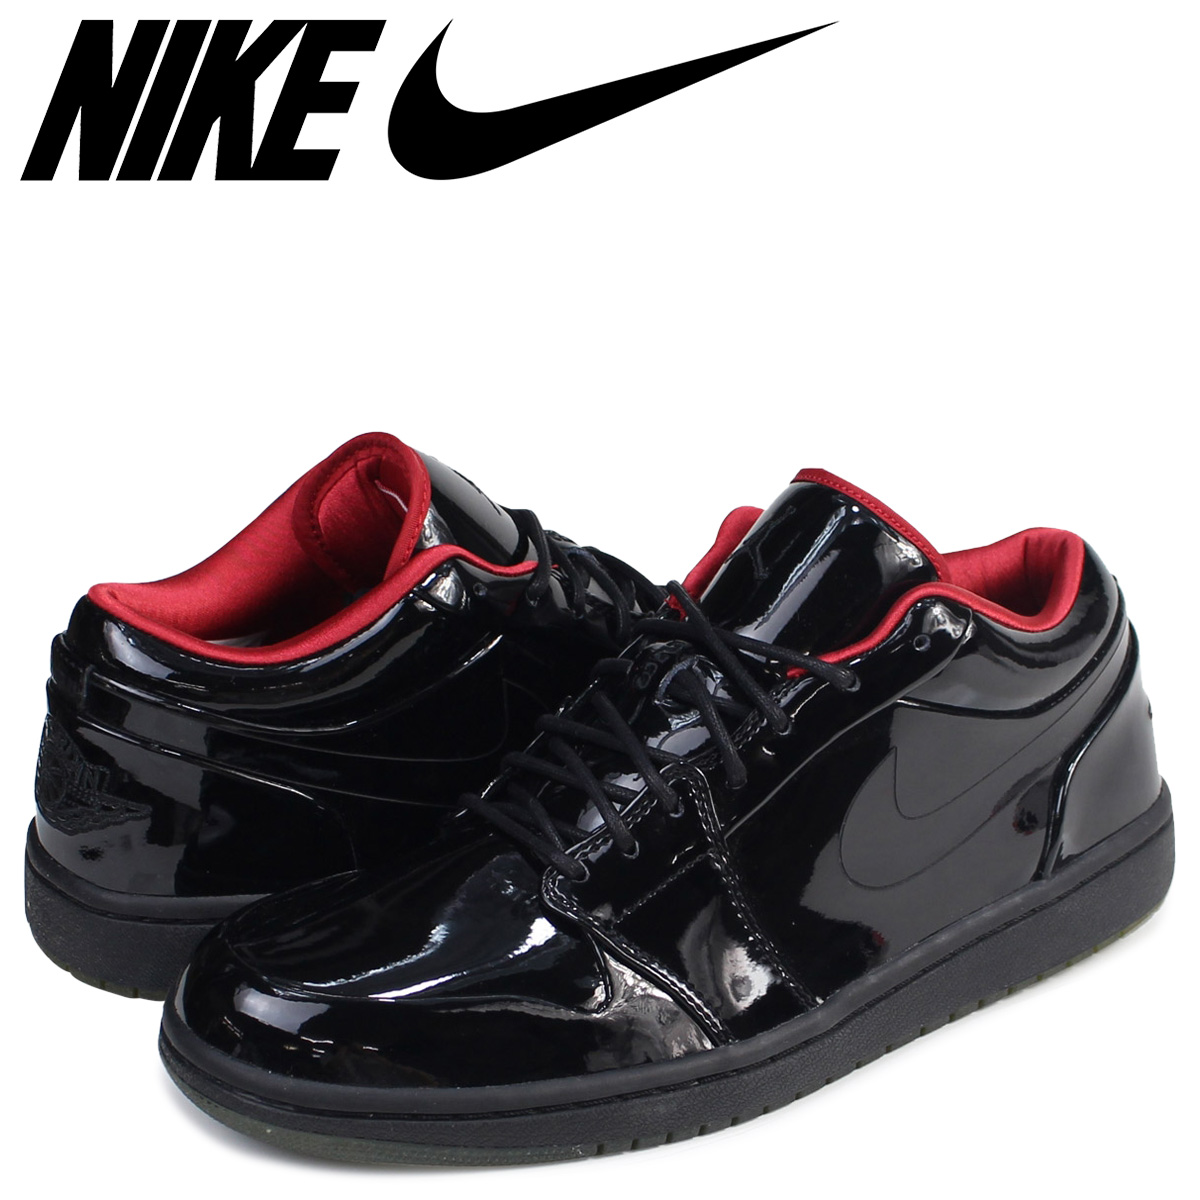 NIKE耐吉空氣喬丹1運動鞋AIR JORDAN 1 PHAT LOW PREMIUM 365763-001人鞋黑色